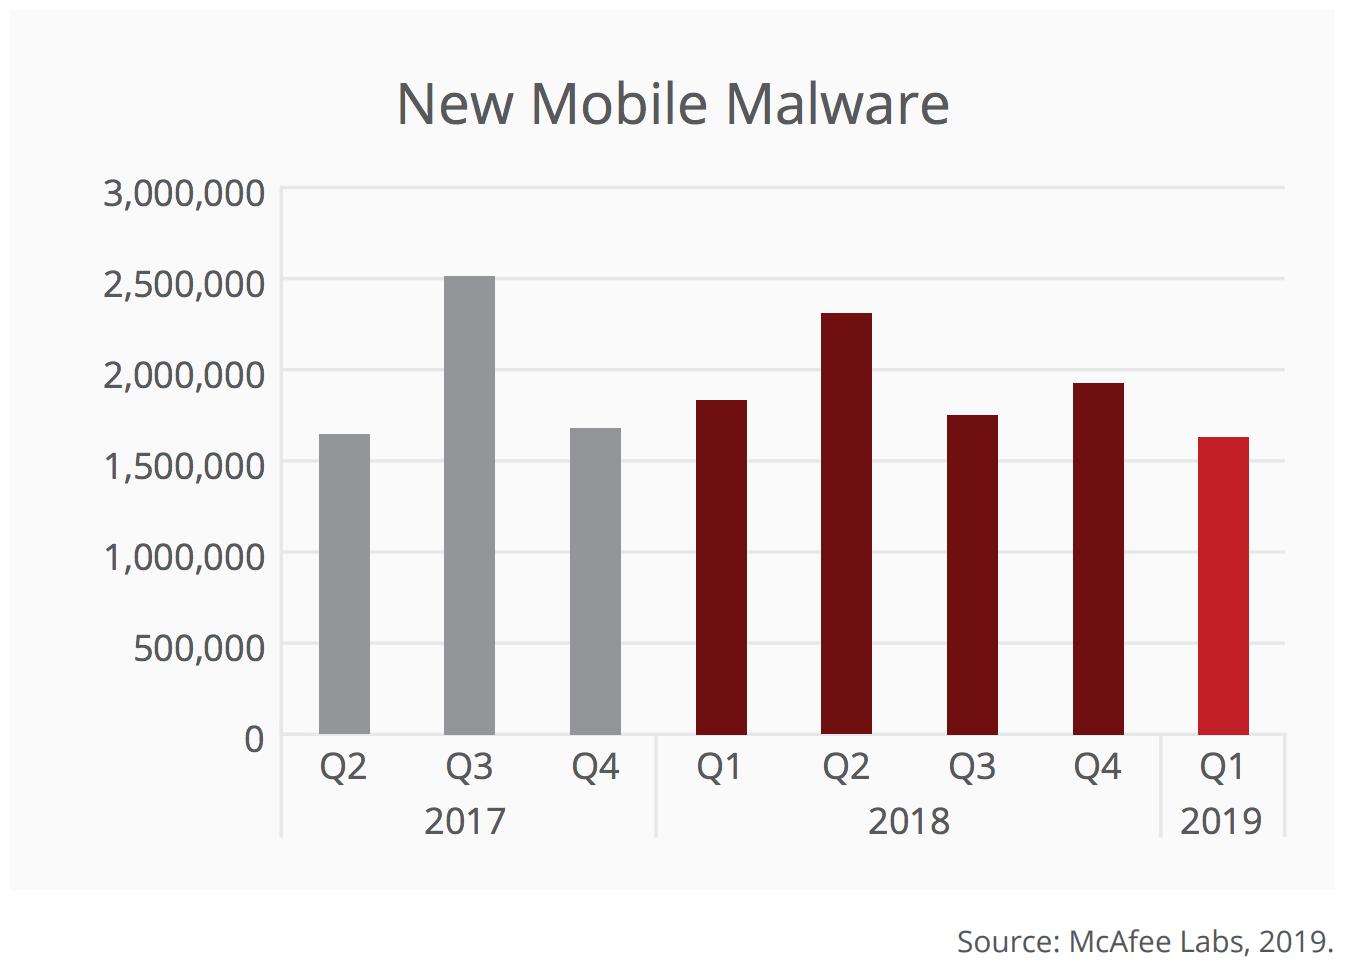 New Mobile Malware